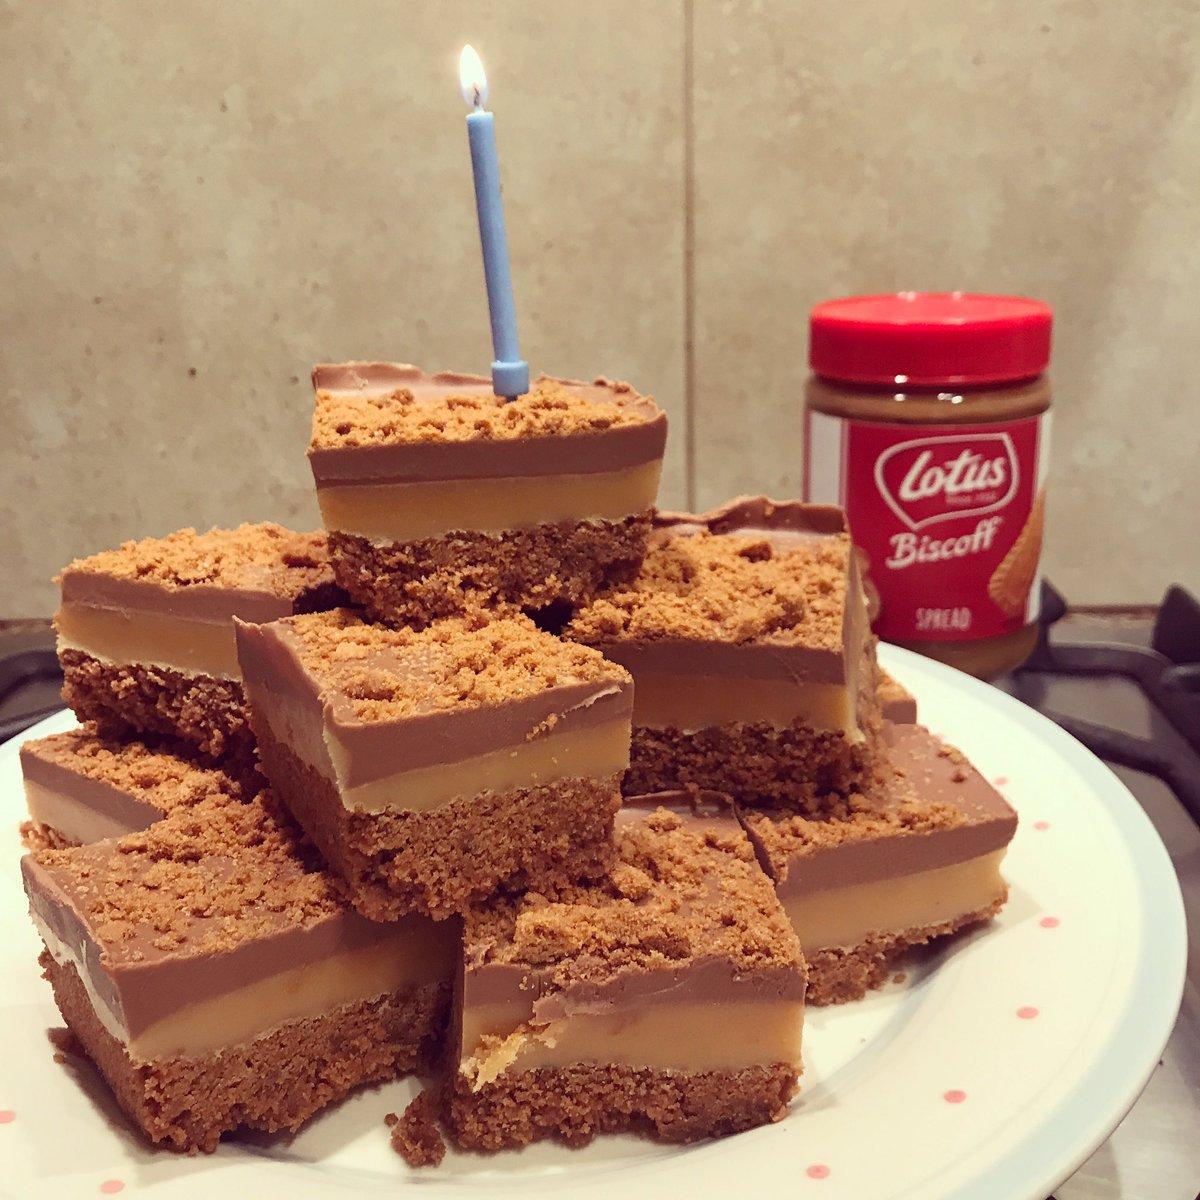 Strange Mrs Bishop Dr Toiitr Alternative Birthday Cake For Dudaspriest Funny Birthday Cards Online Barepcheapnameinfo